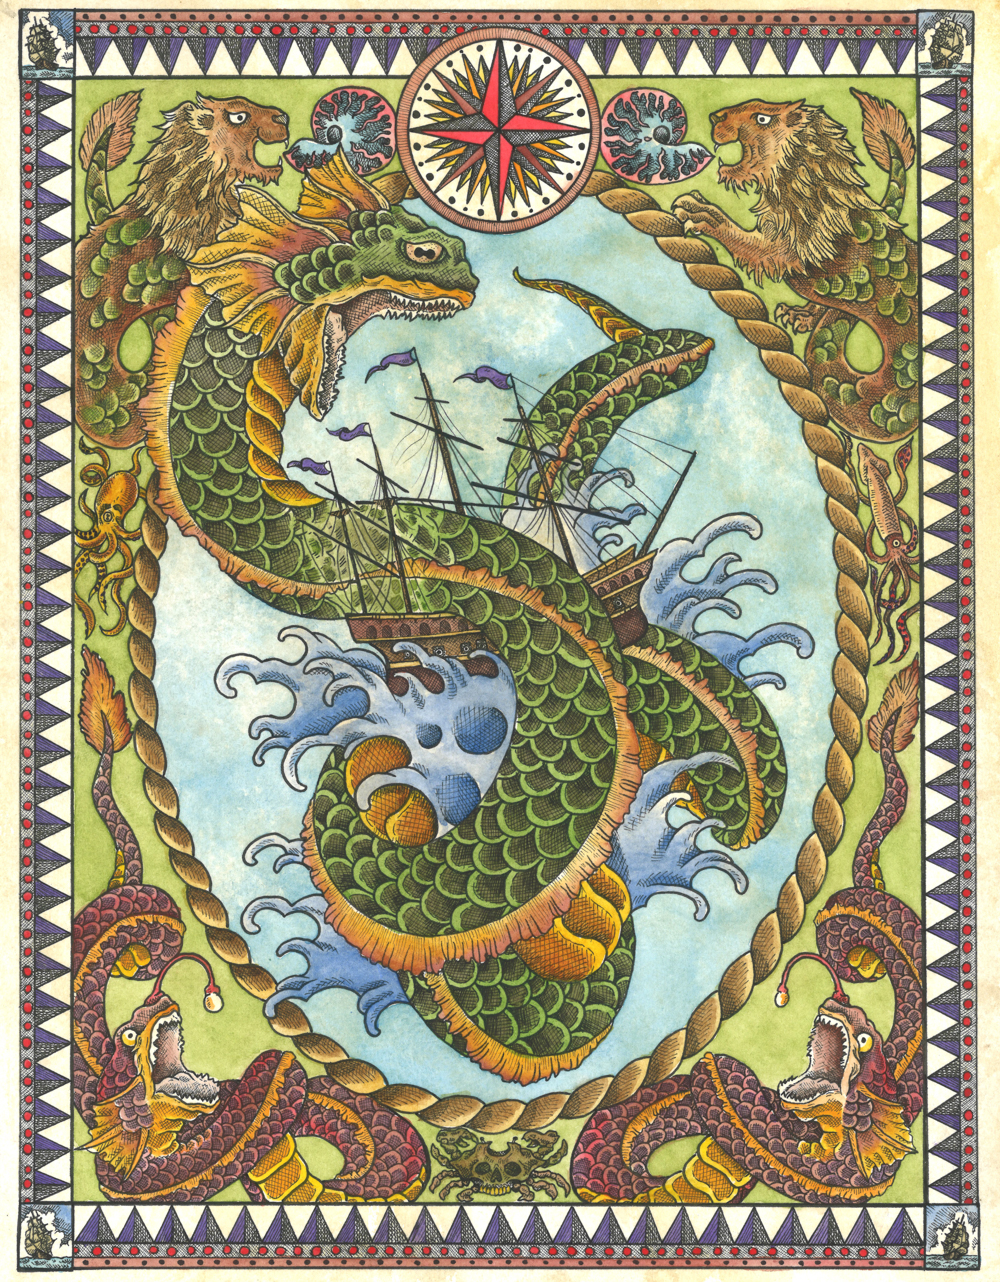 Sea Serpent Ship Battle